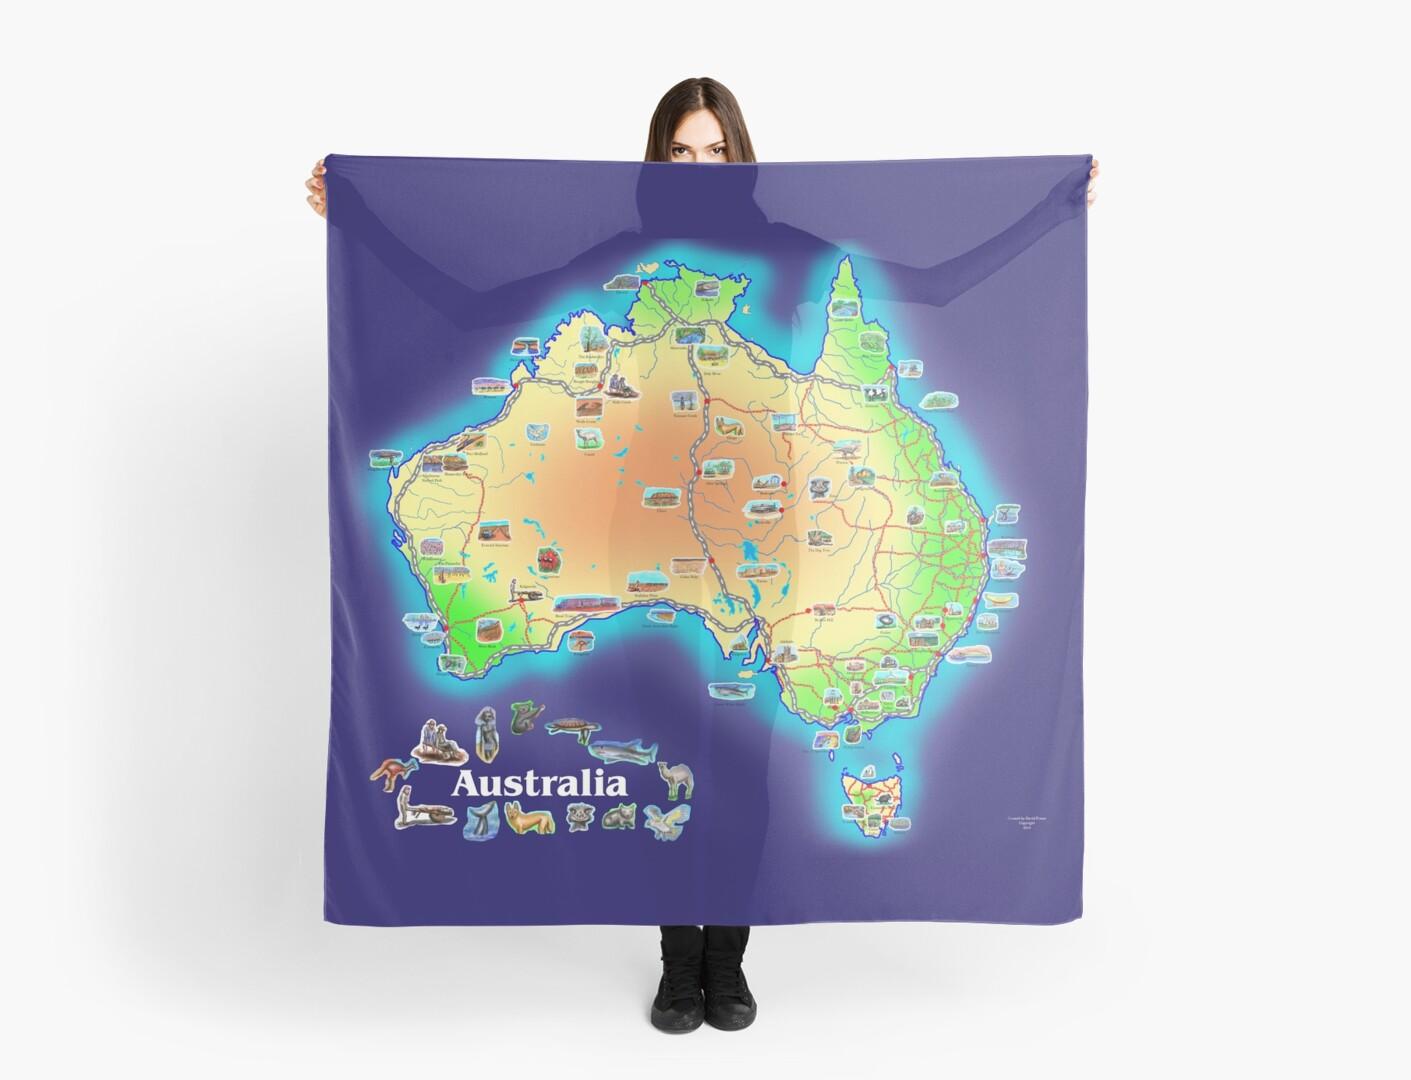 Australia map scarf by David Fraser